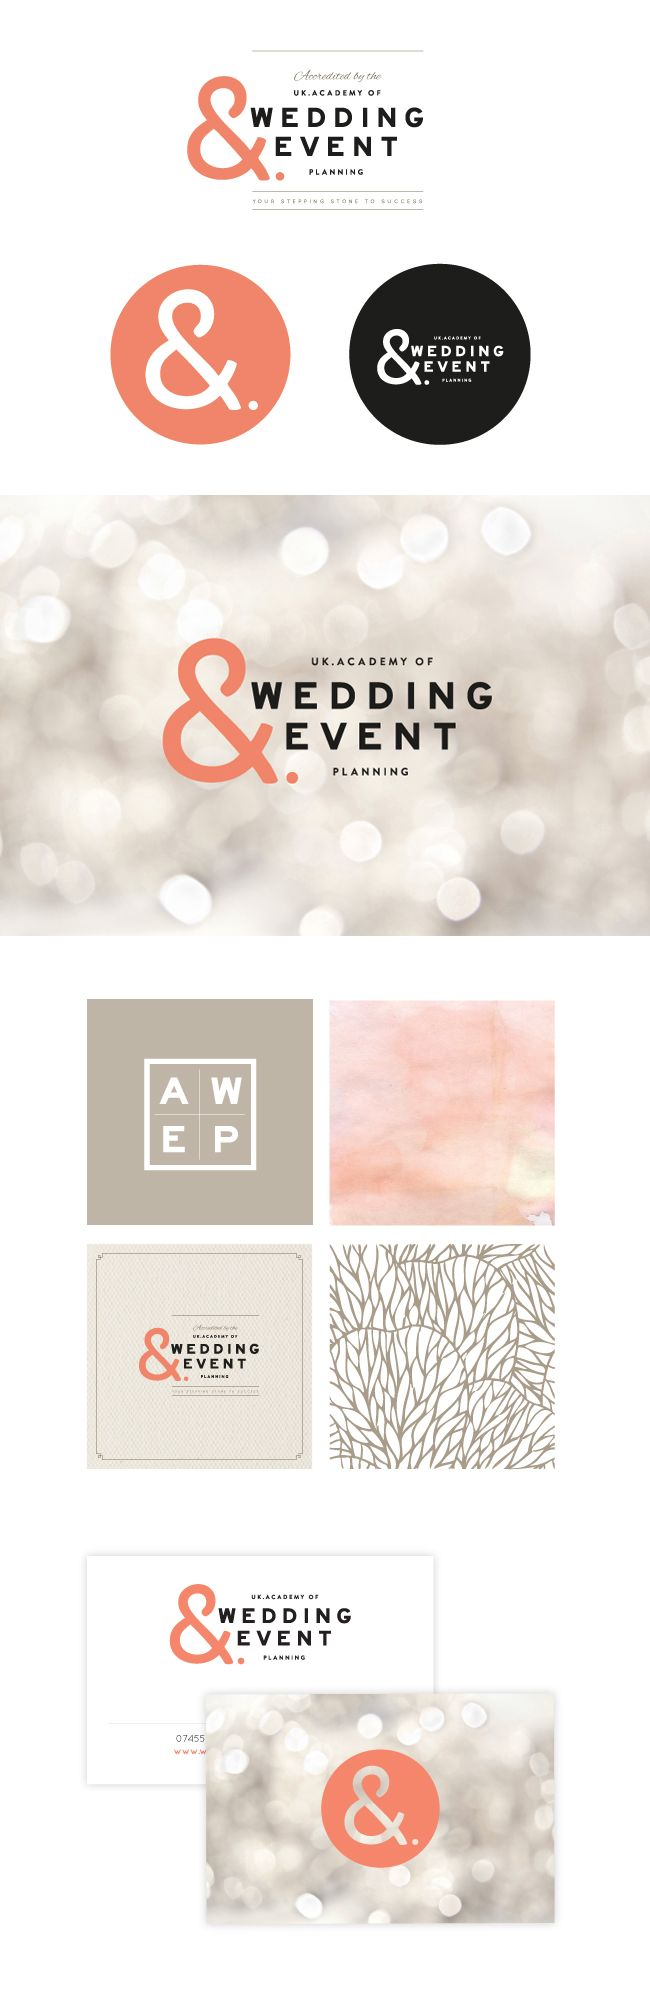 Academy of event wedding  event planning brand identity